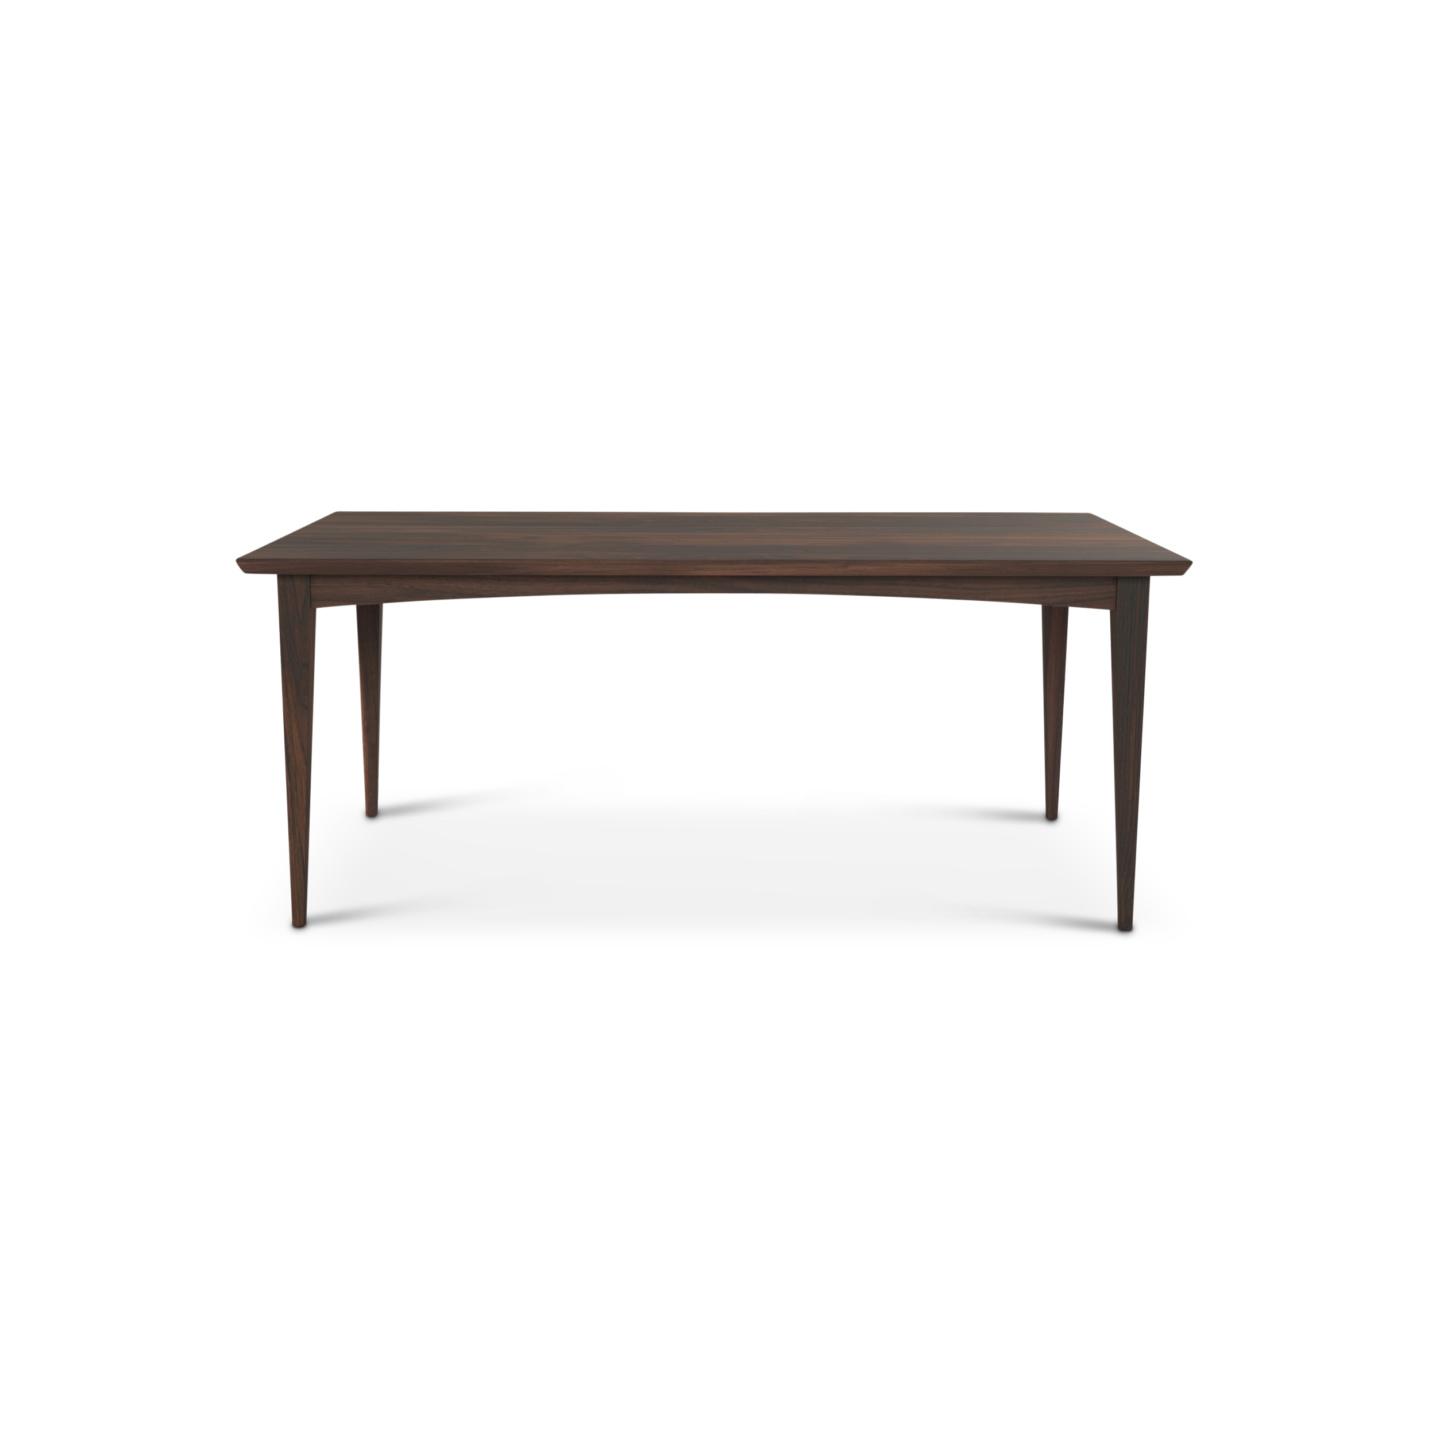 Solid walnut mid-century modern table